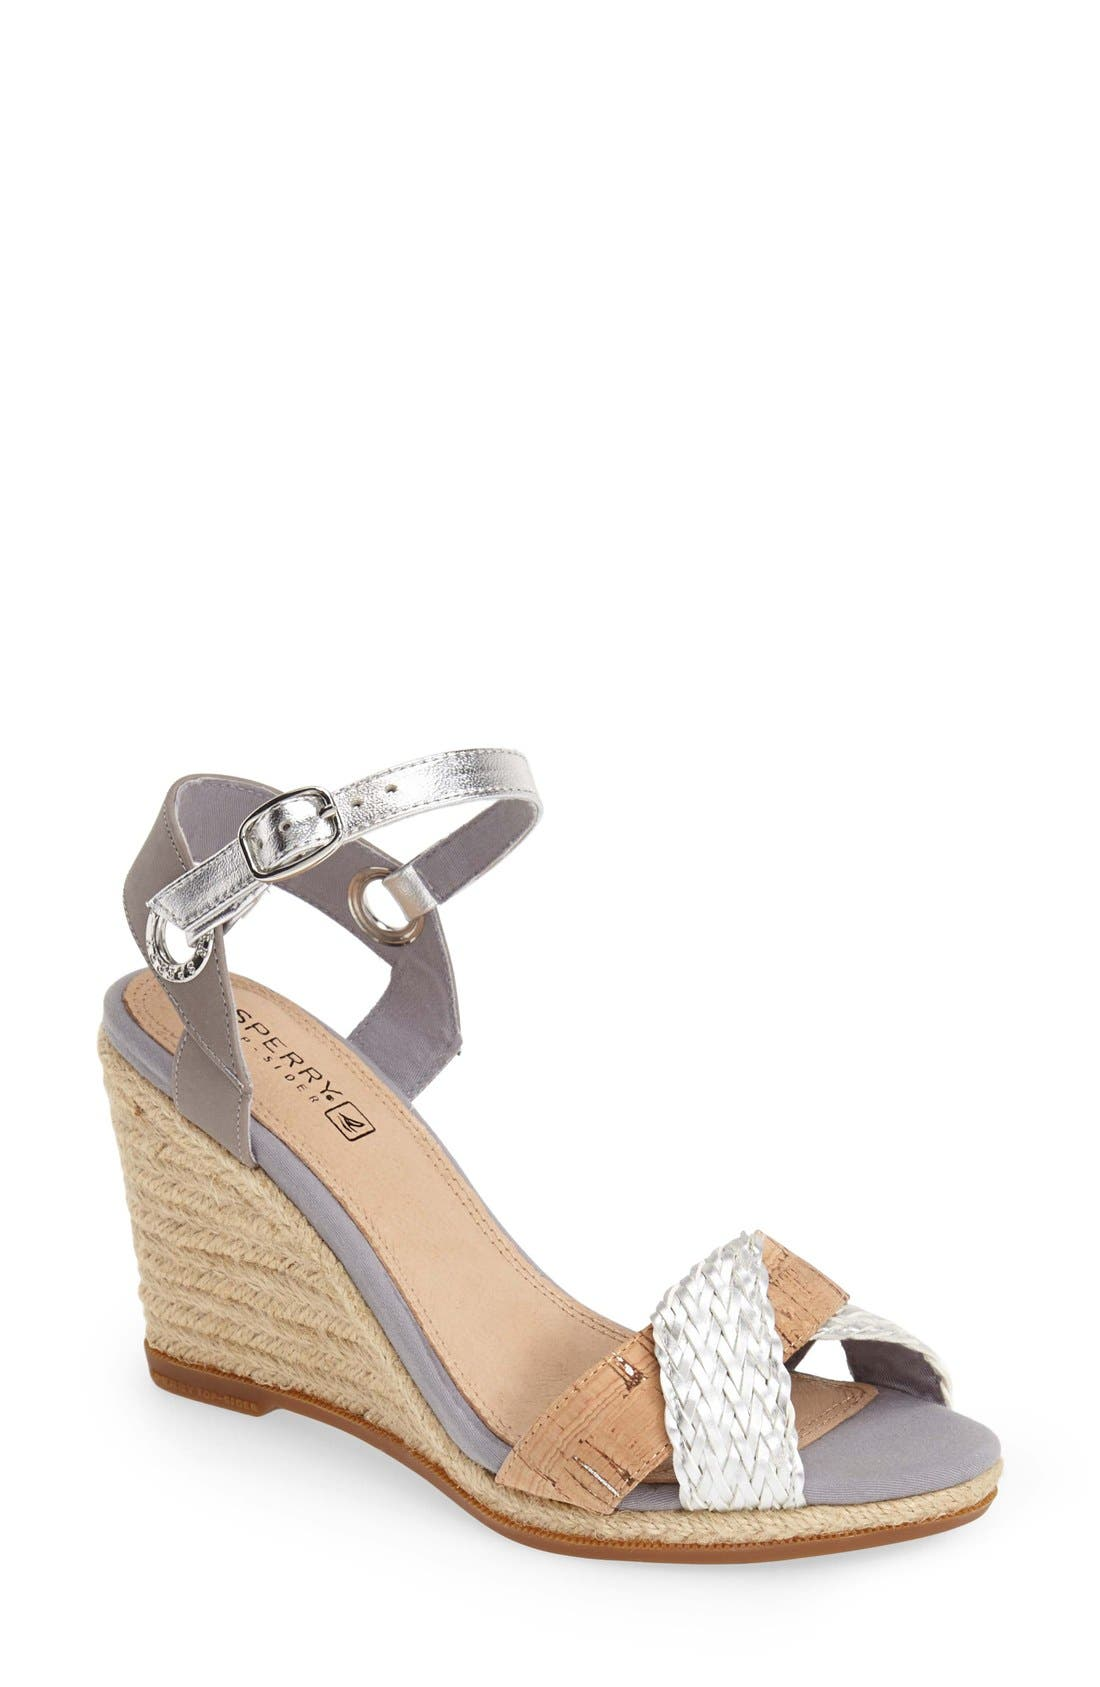 Alternate Image 1 Selected - Sperry 'Saylor' Sandal (Women)